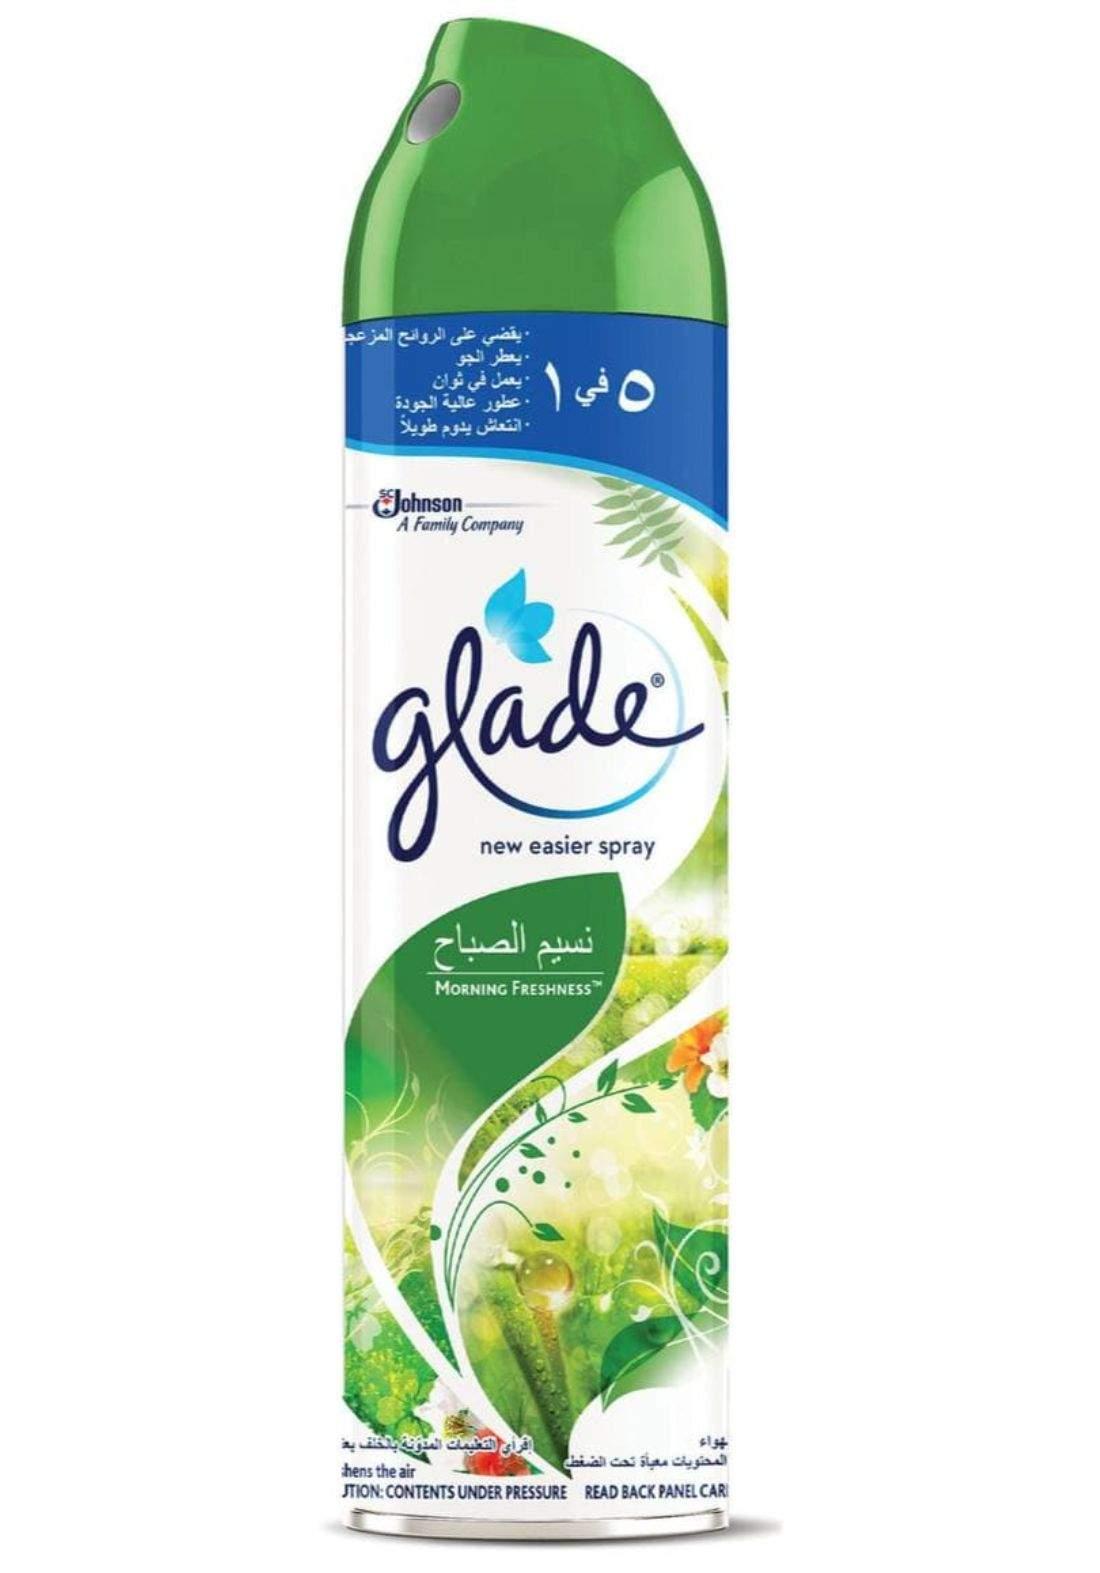 Air Freshener From glade  جليد معطر الجو